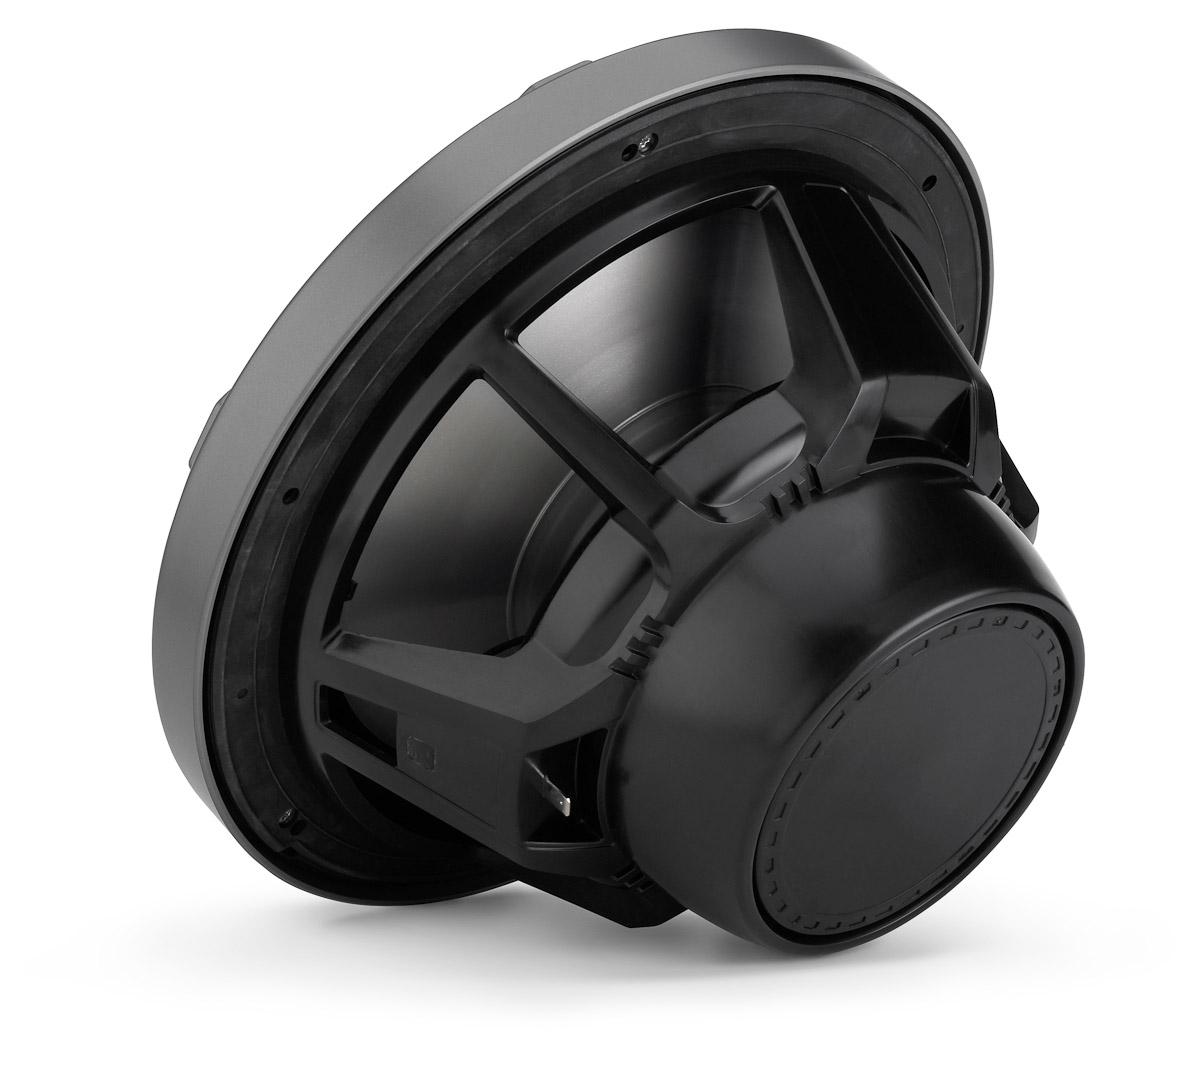 Jl Audio Mx10ib3 Cg Tb 10 Inch 250 Mm Marine Subwoofer Driver 8 Titanium Classic Grilles 4 Creative